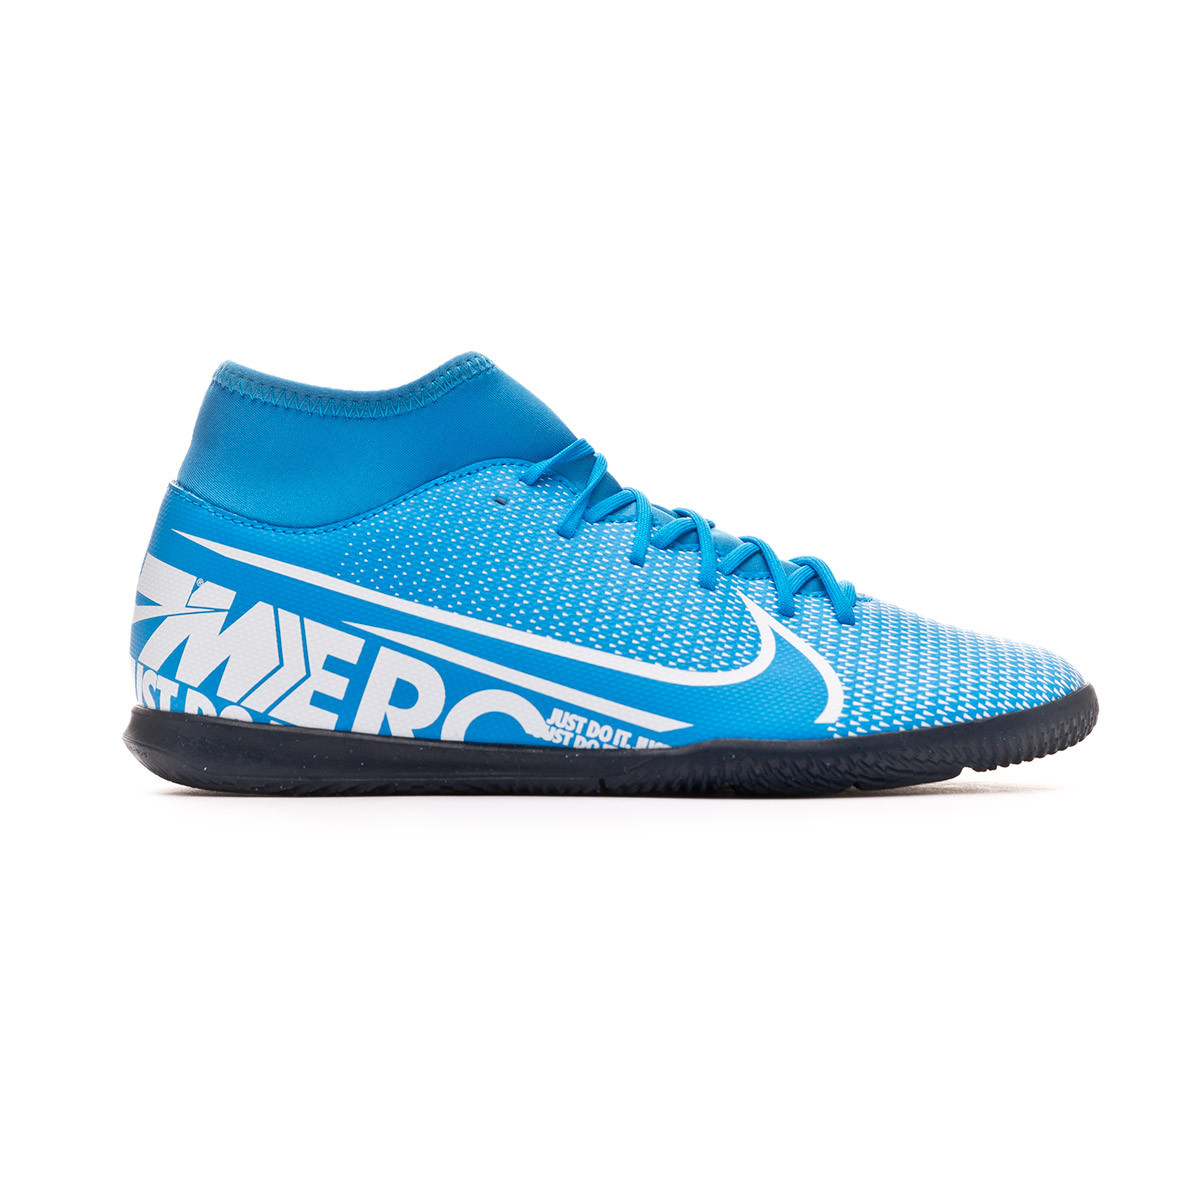 Cheap Nike Superfly 7 Club, Cheapest Nike Superfly 7 Club FG Boots